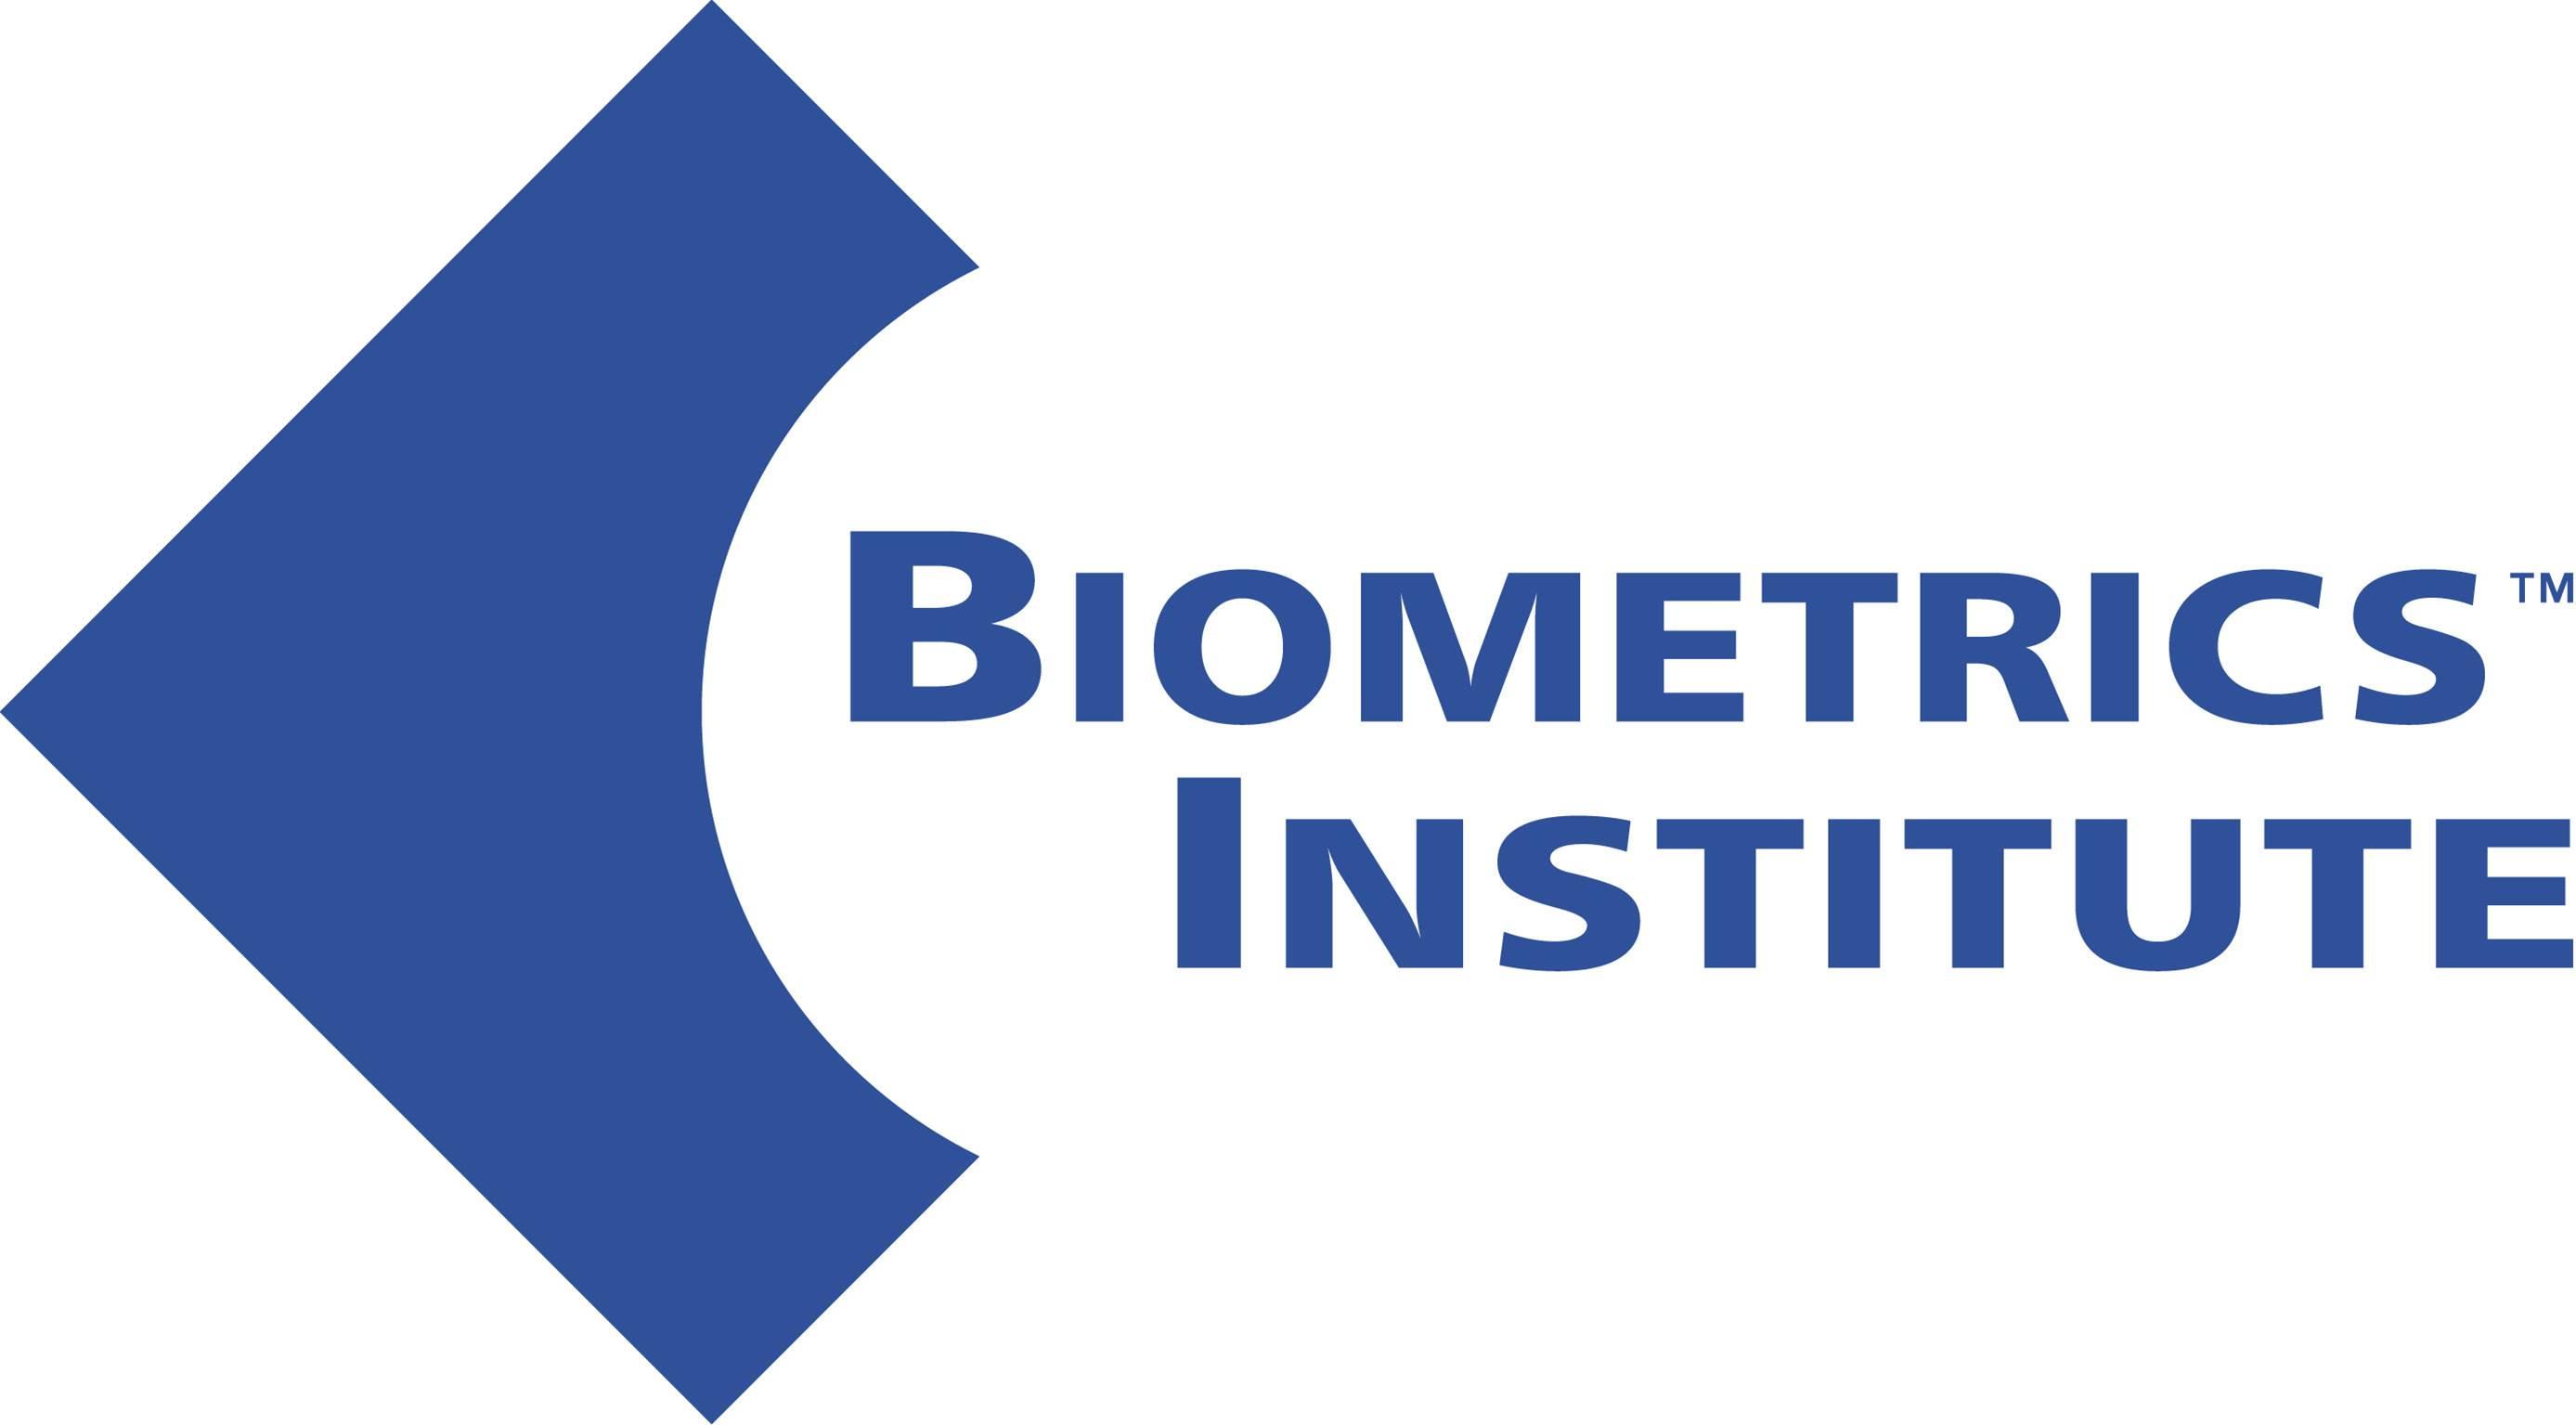 2016 Biometrics Institute Asia-Pacific Conference